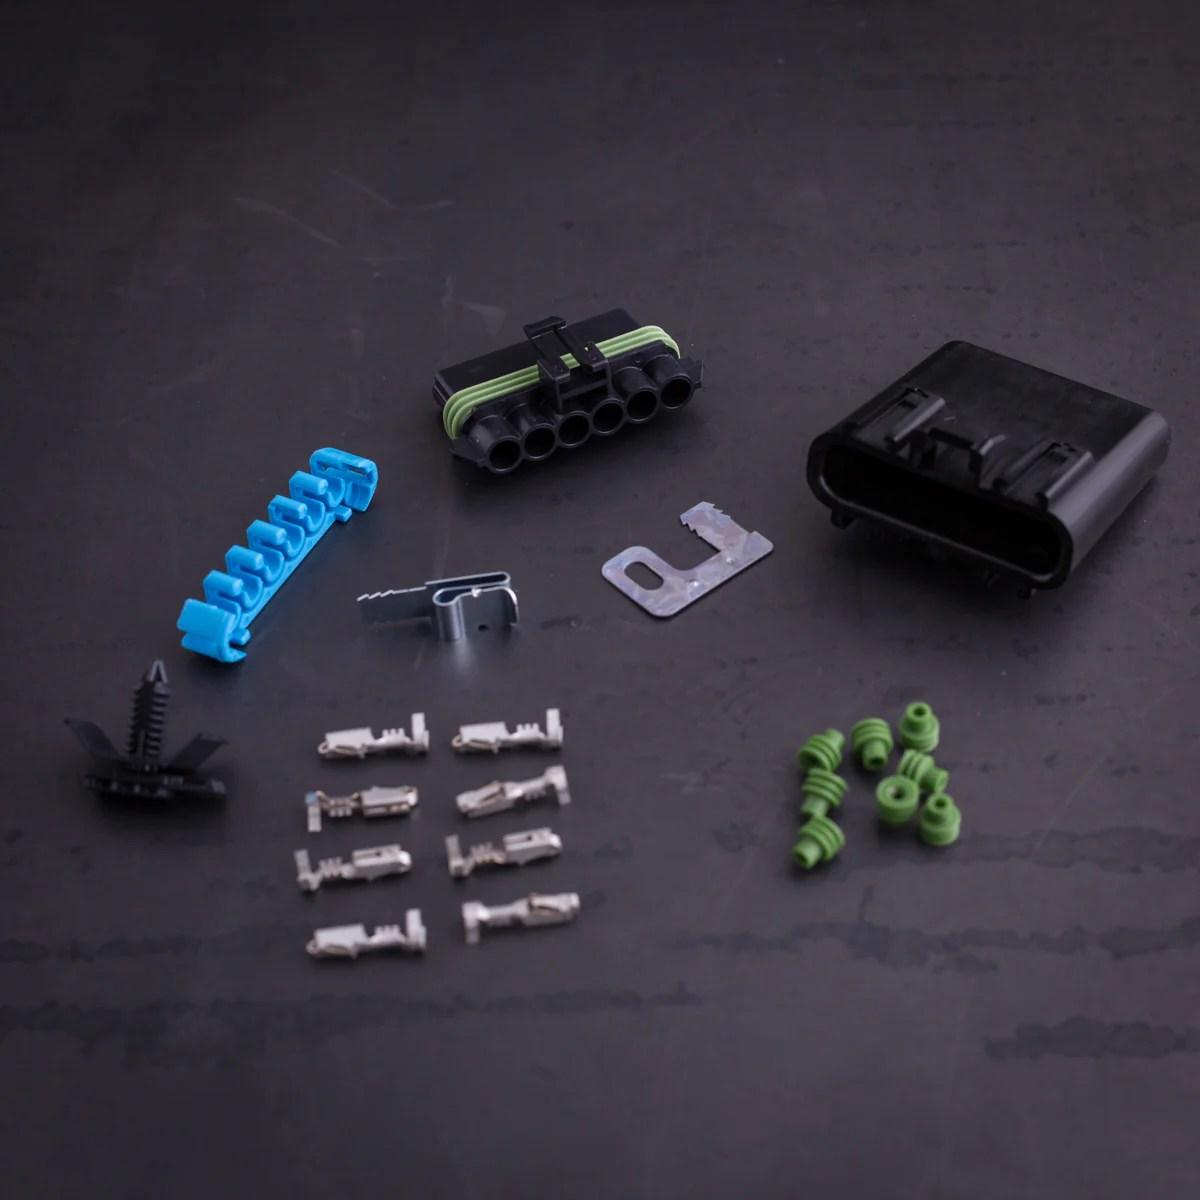 fuse box on motorcycle [ 1200 x 1200 Pixel ]